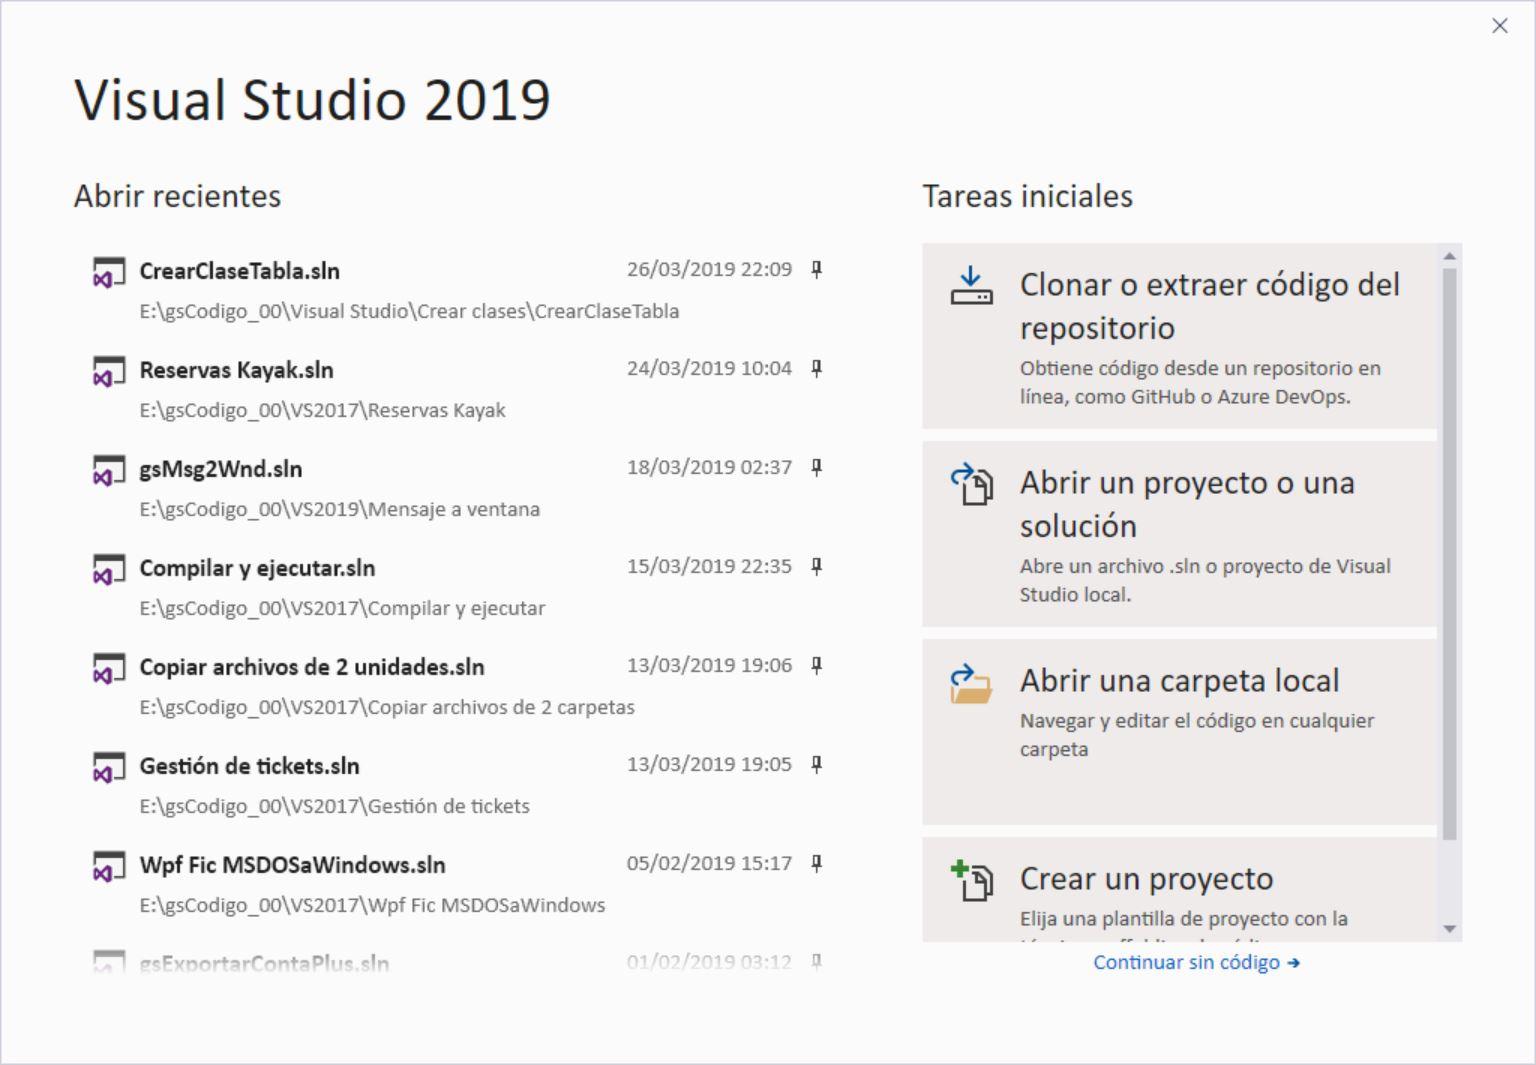 La pantalla de inicio de Visual Studio 2019